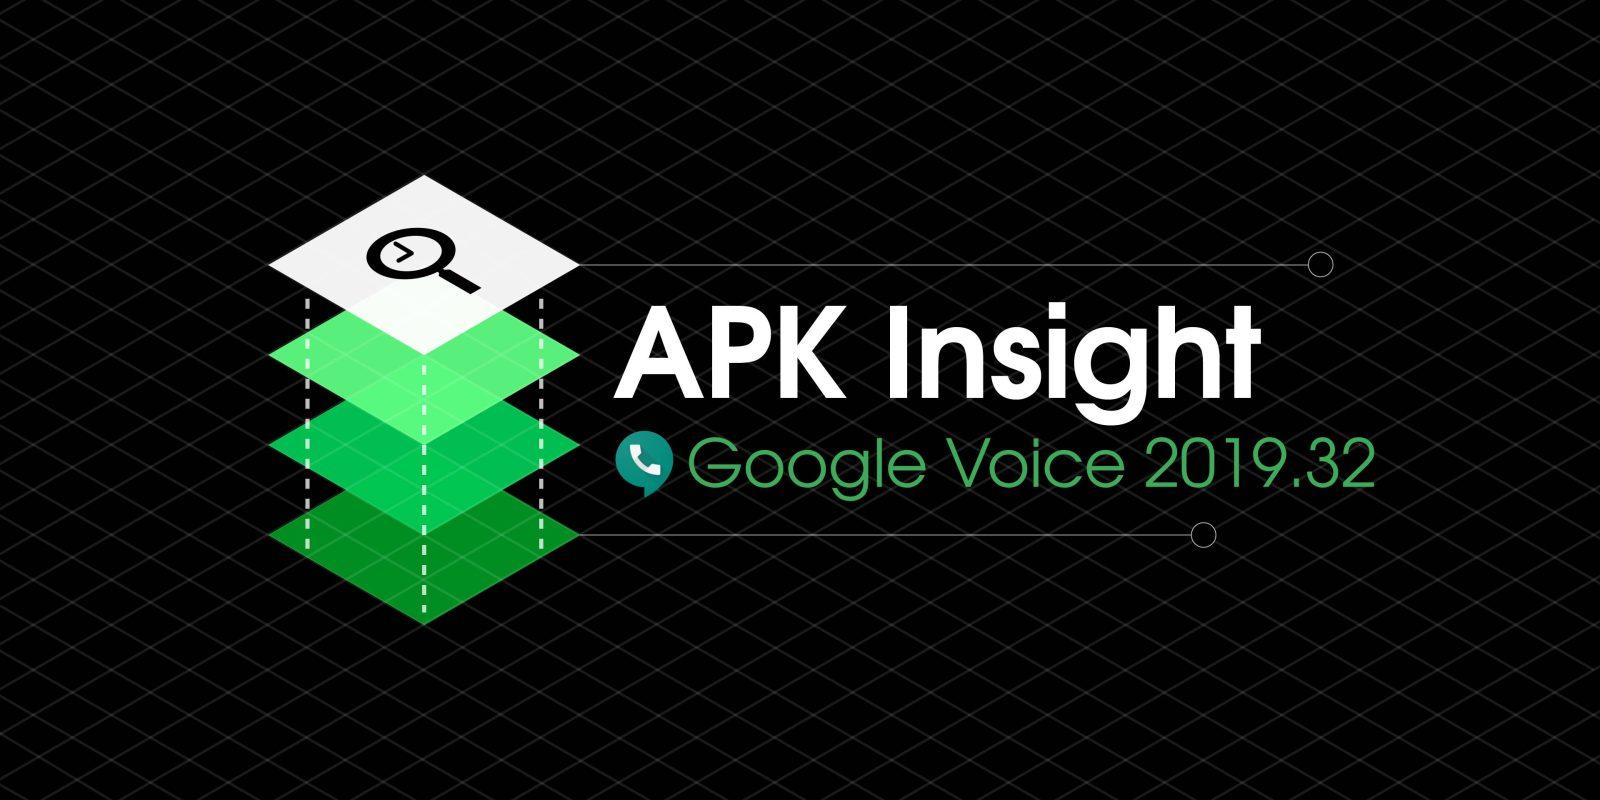 APK Insight - 9to5Google